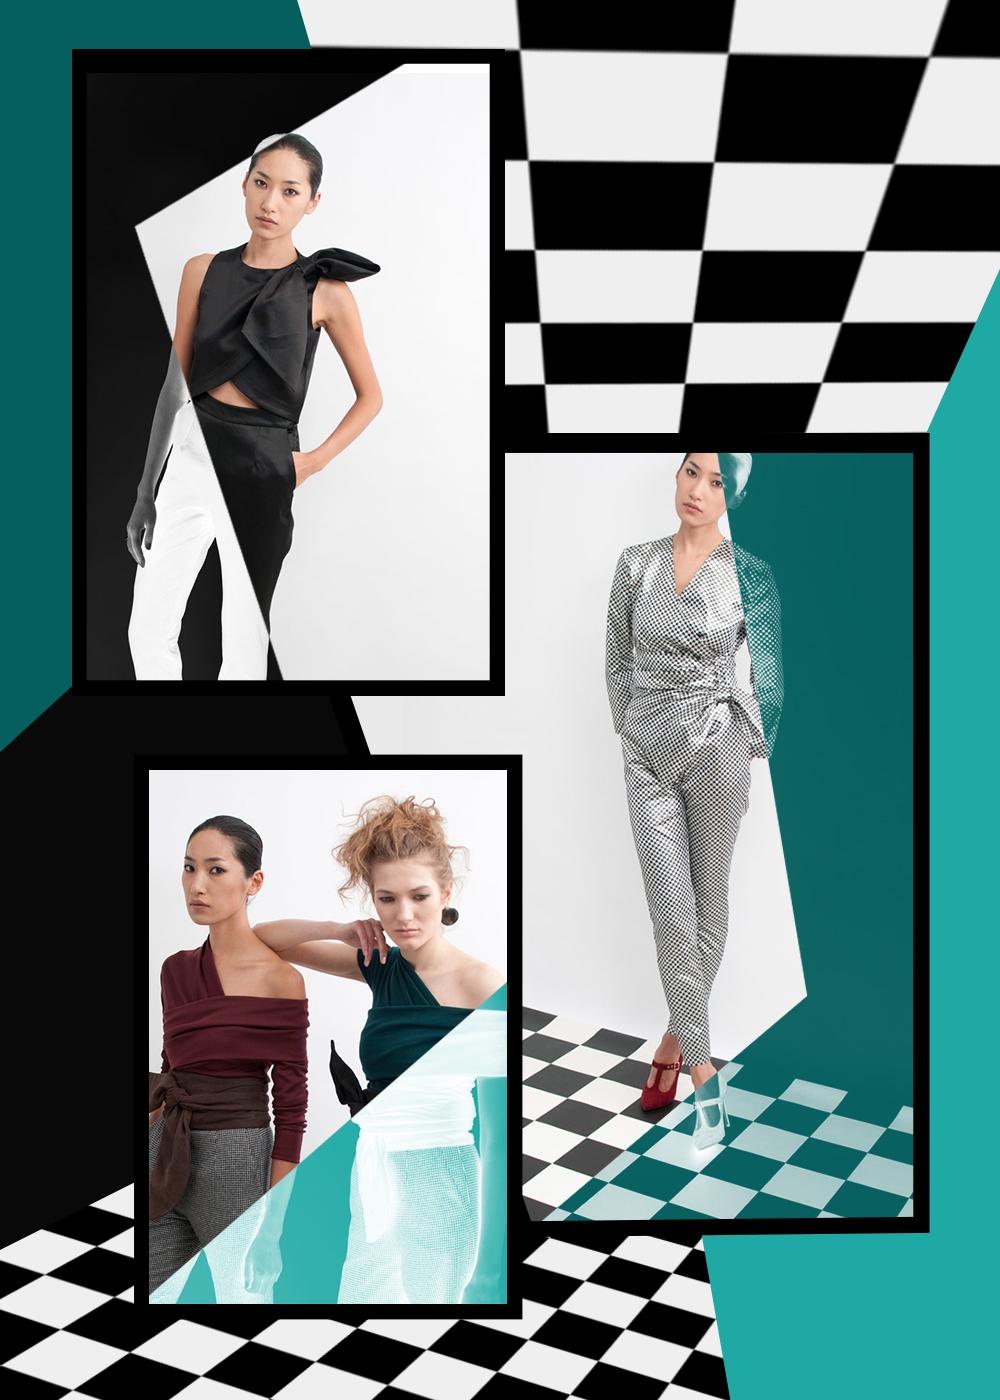 Maison-Mittweg-Designers-Isa-Arfen-Evening-Separates